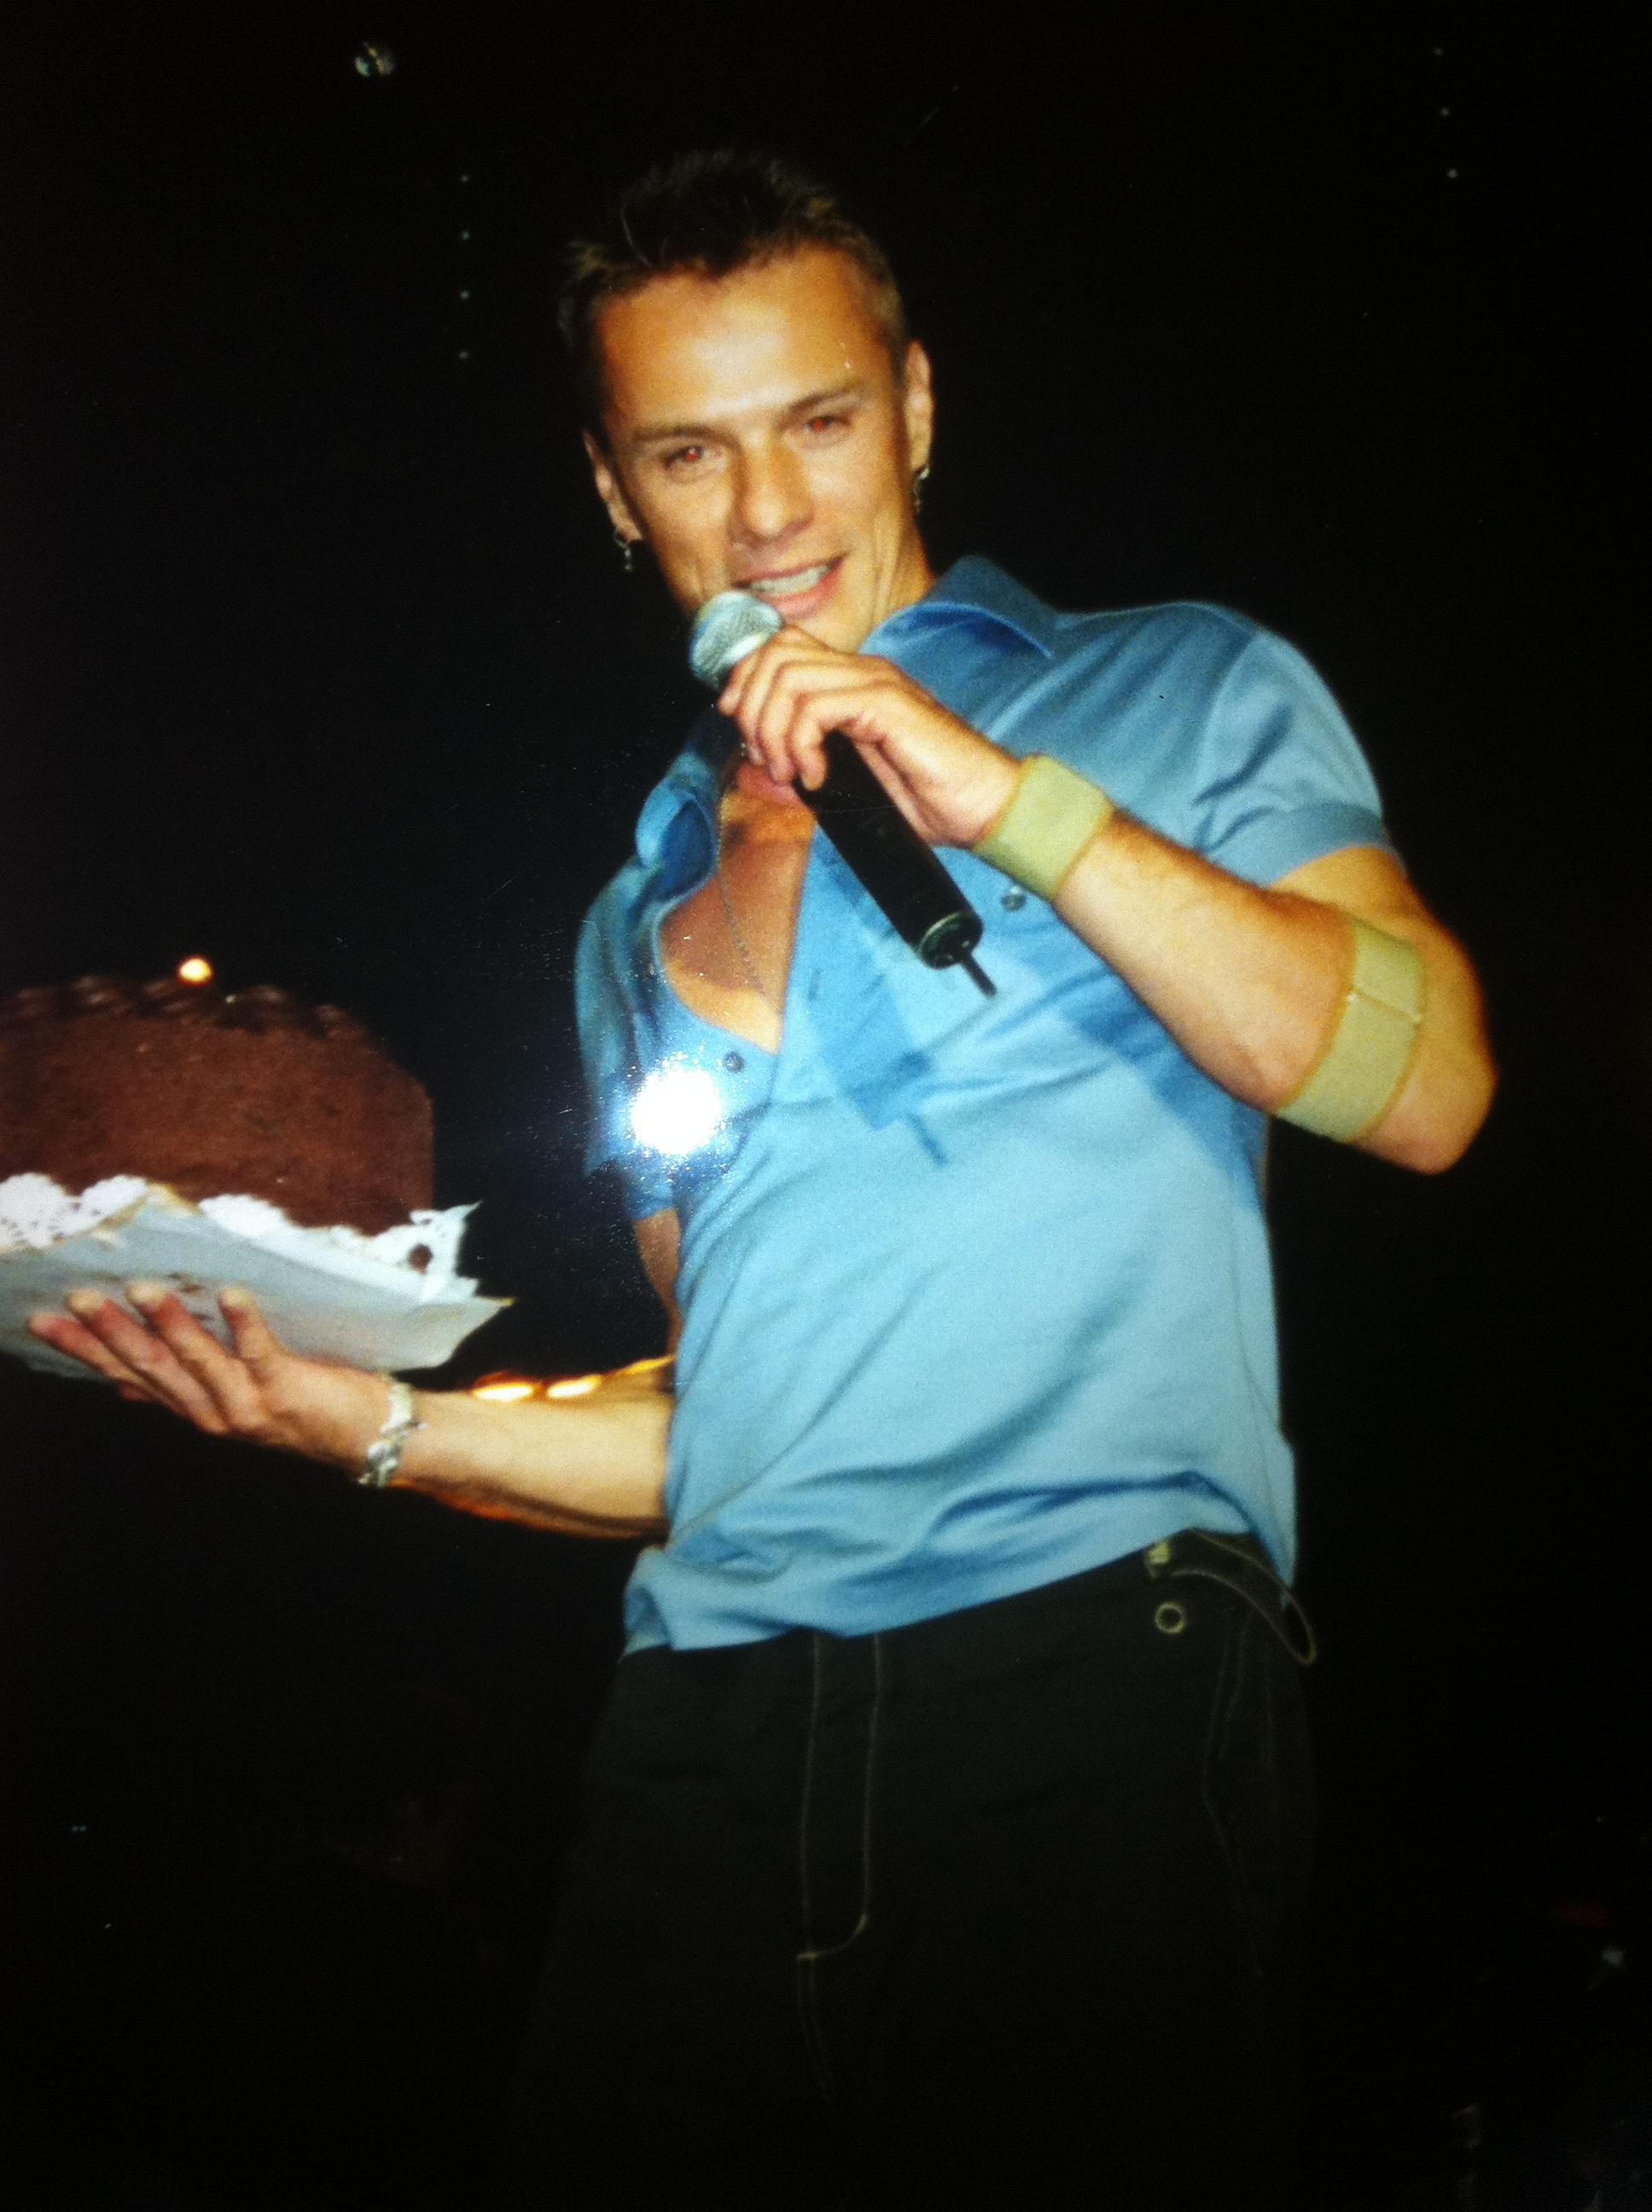 87-larrys-birthday-cake.jpg